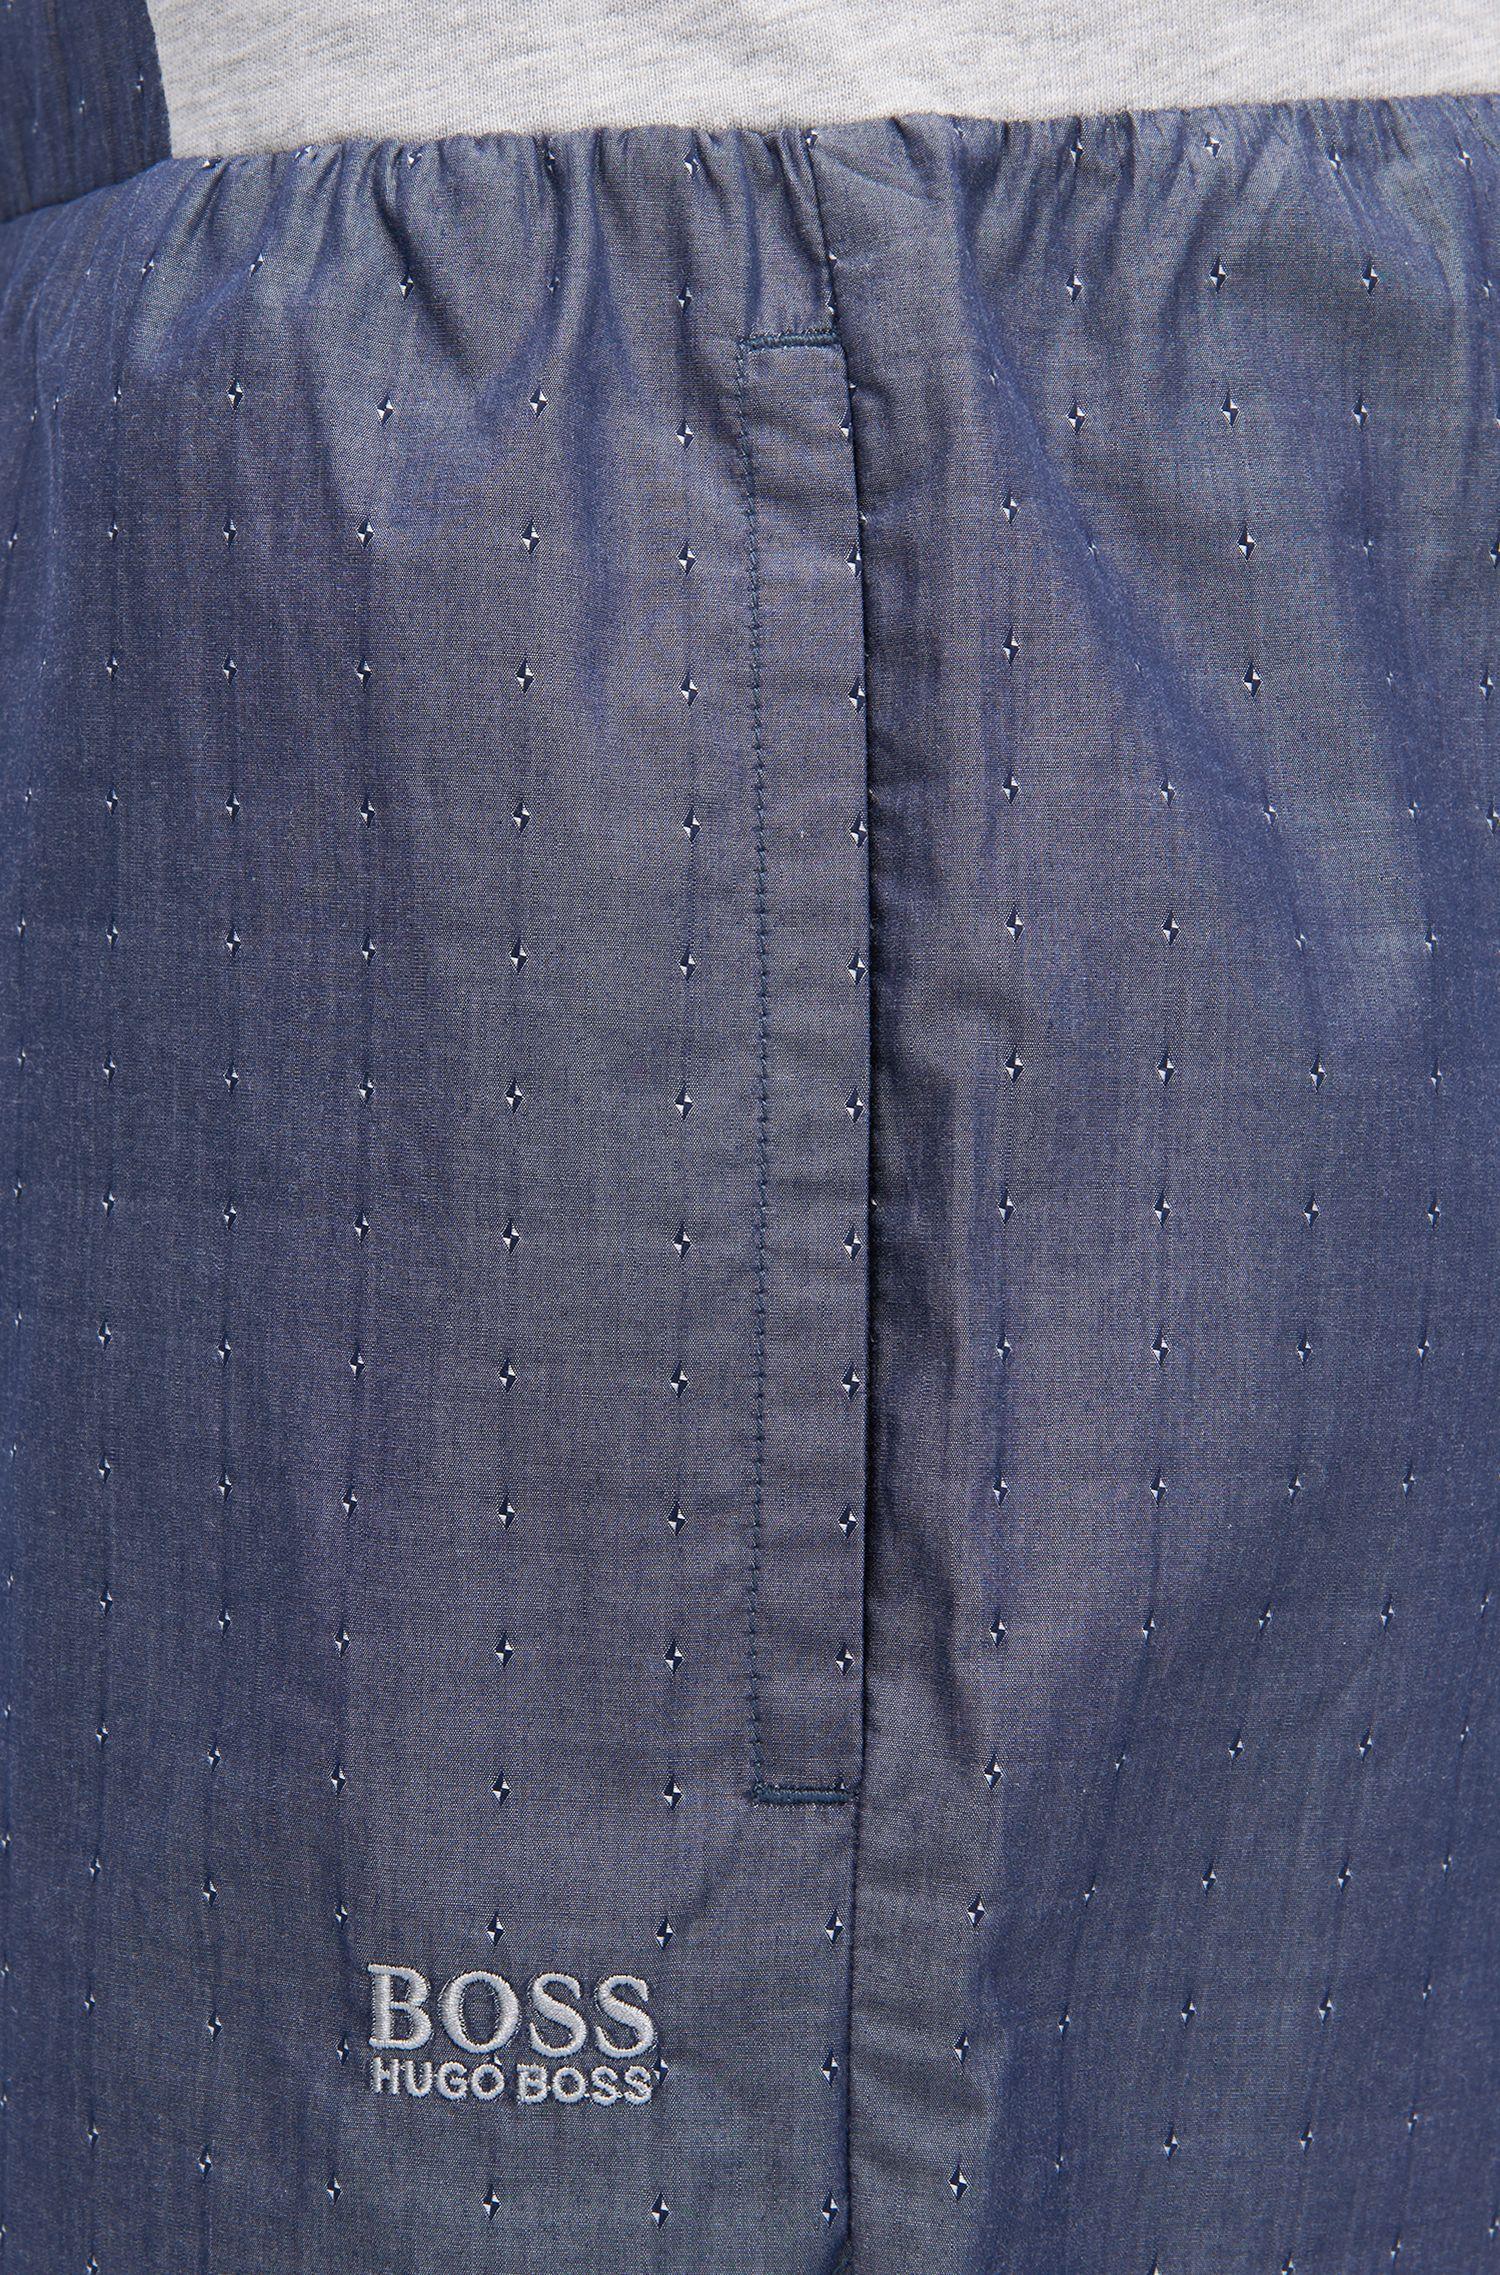 Pyjamashorts aus Baumwolle mit Fil-coupé-Muster